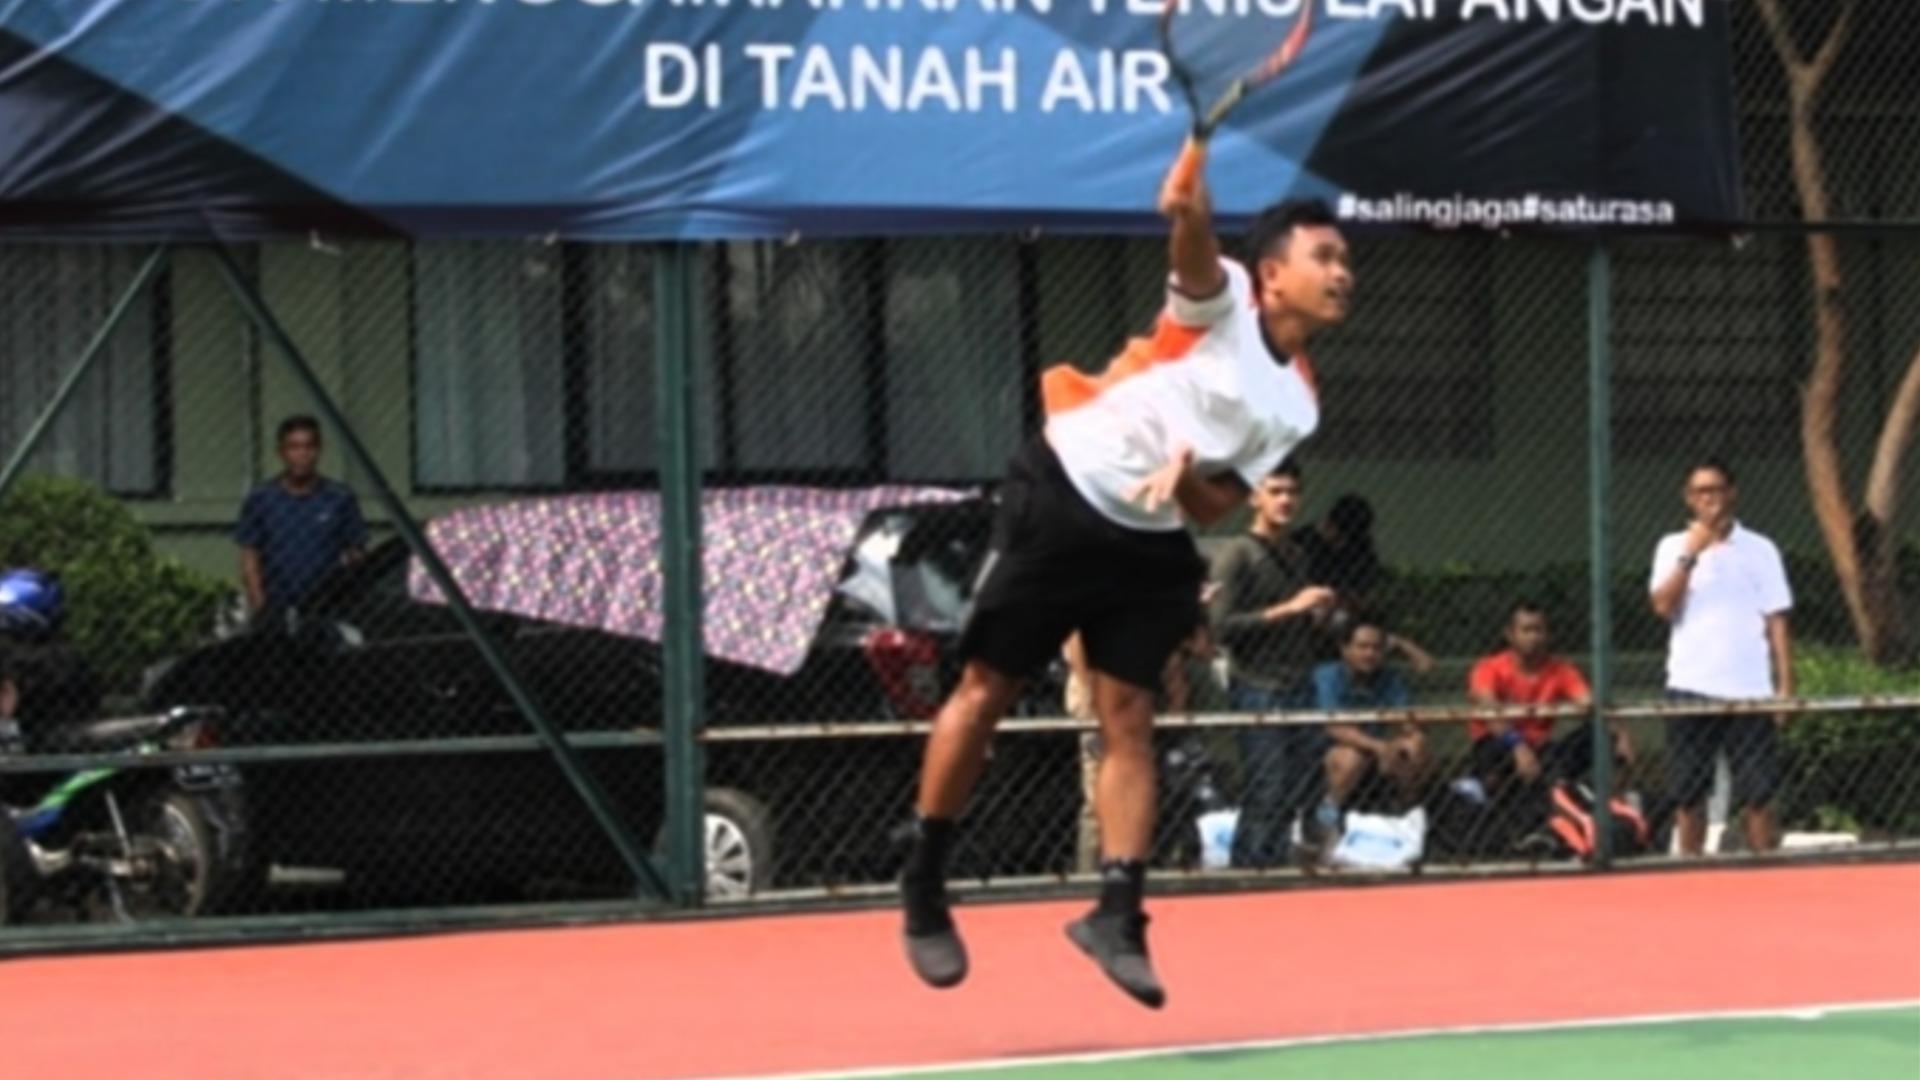 Coach Tenis Budy Hartanto